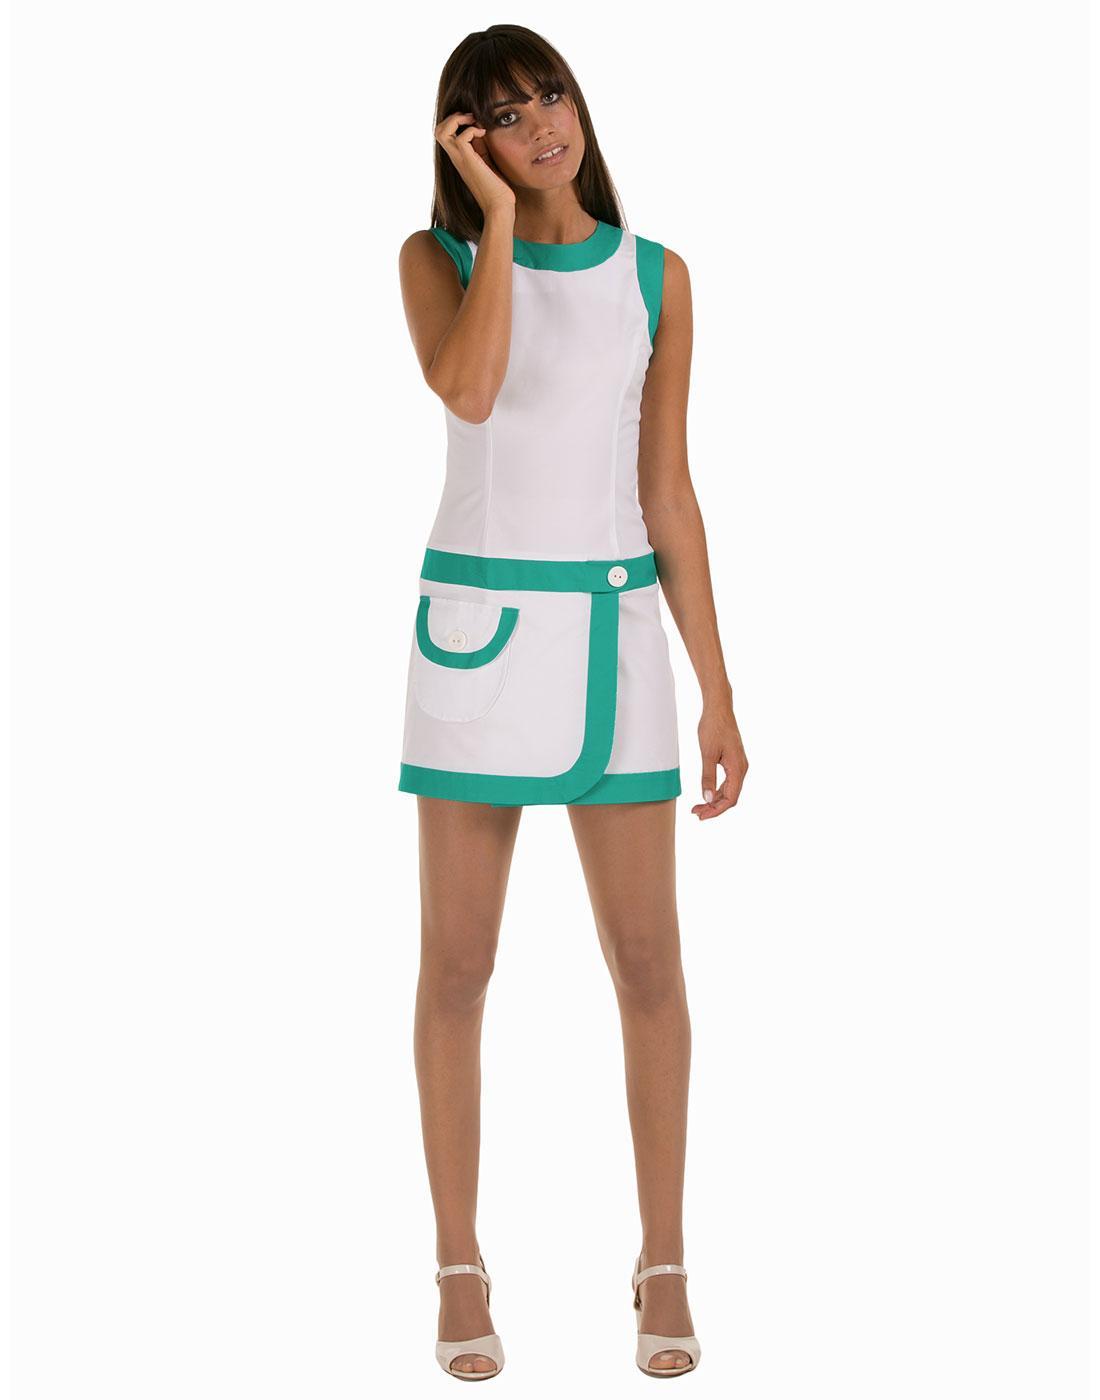 MARMALADE Retro Mod Sixties Style Tennis Dress